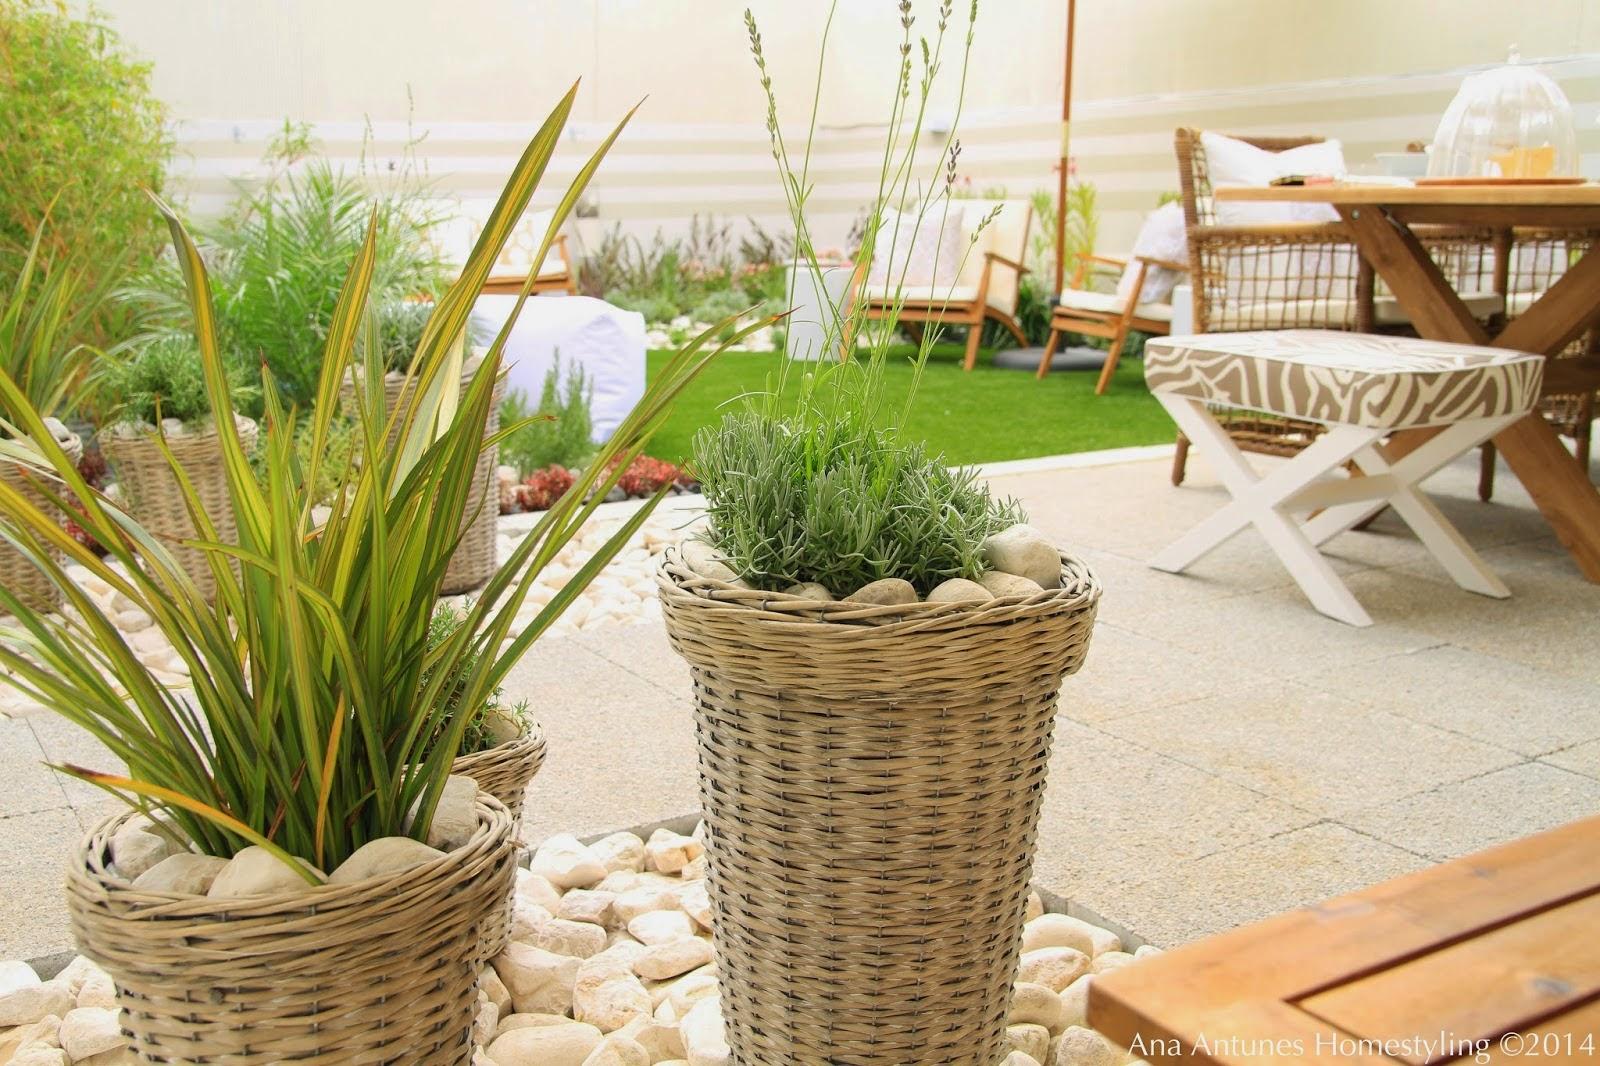 decorar um jardim : decorar um jardim:Bricolage e Decoração: Ideias para Decorar um Jardim ou Terraço